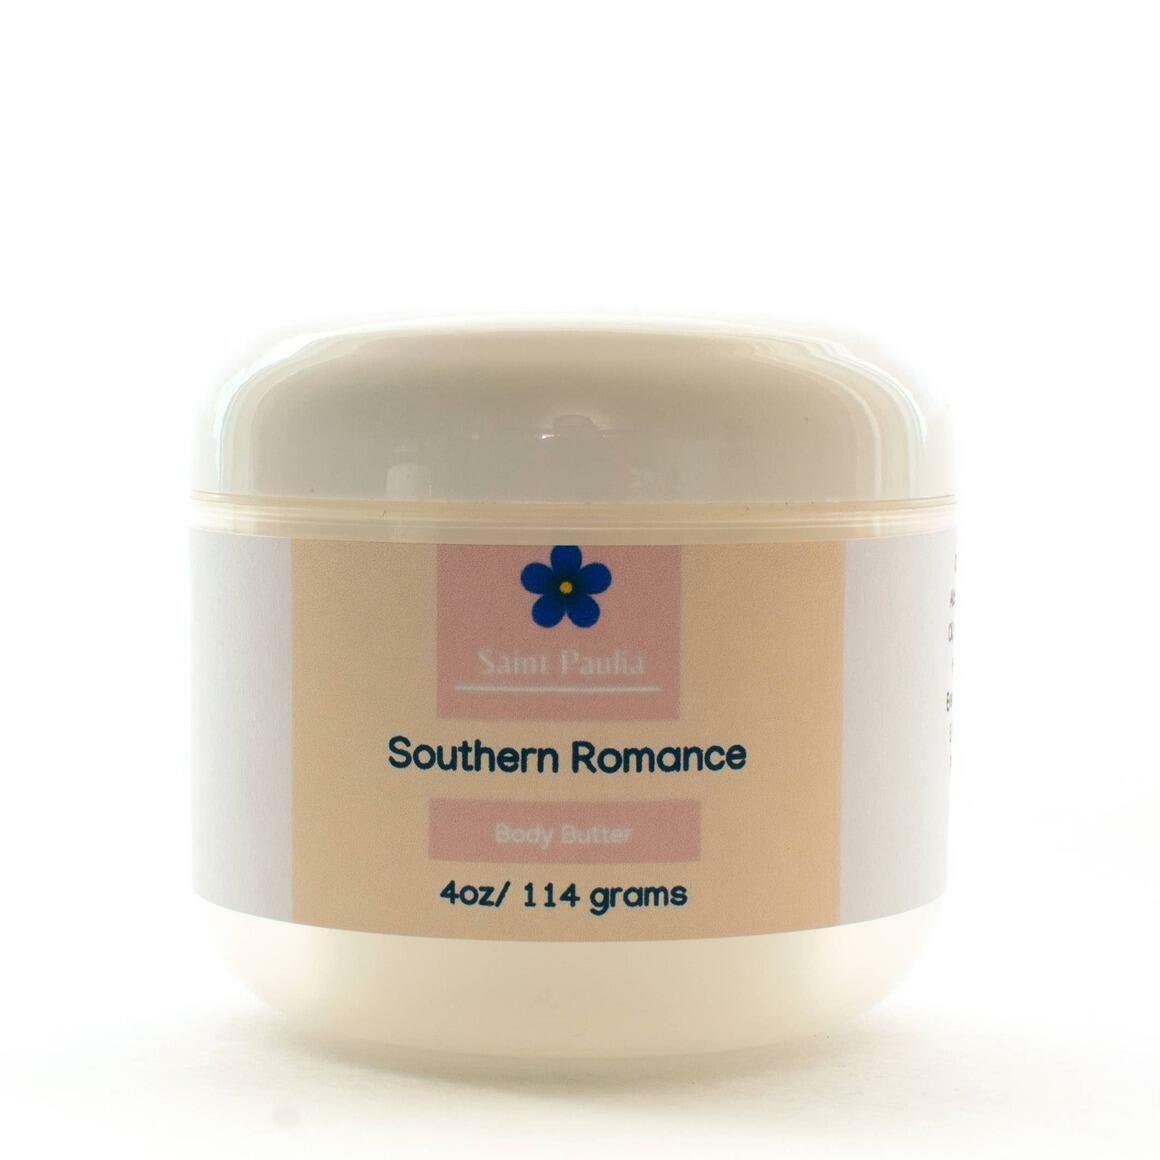 Southern Romance Body Butter | Trada Marketplace